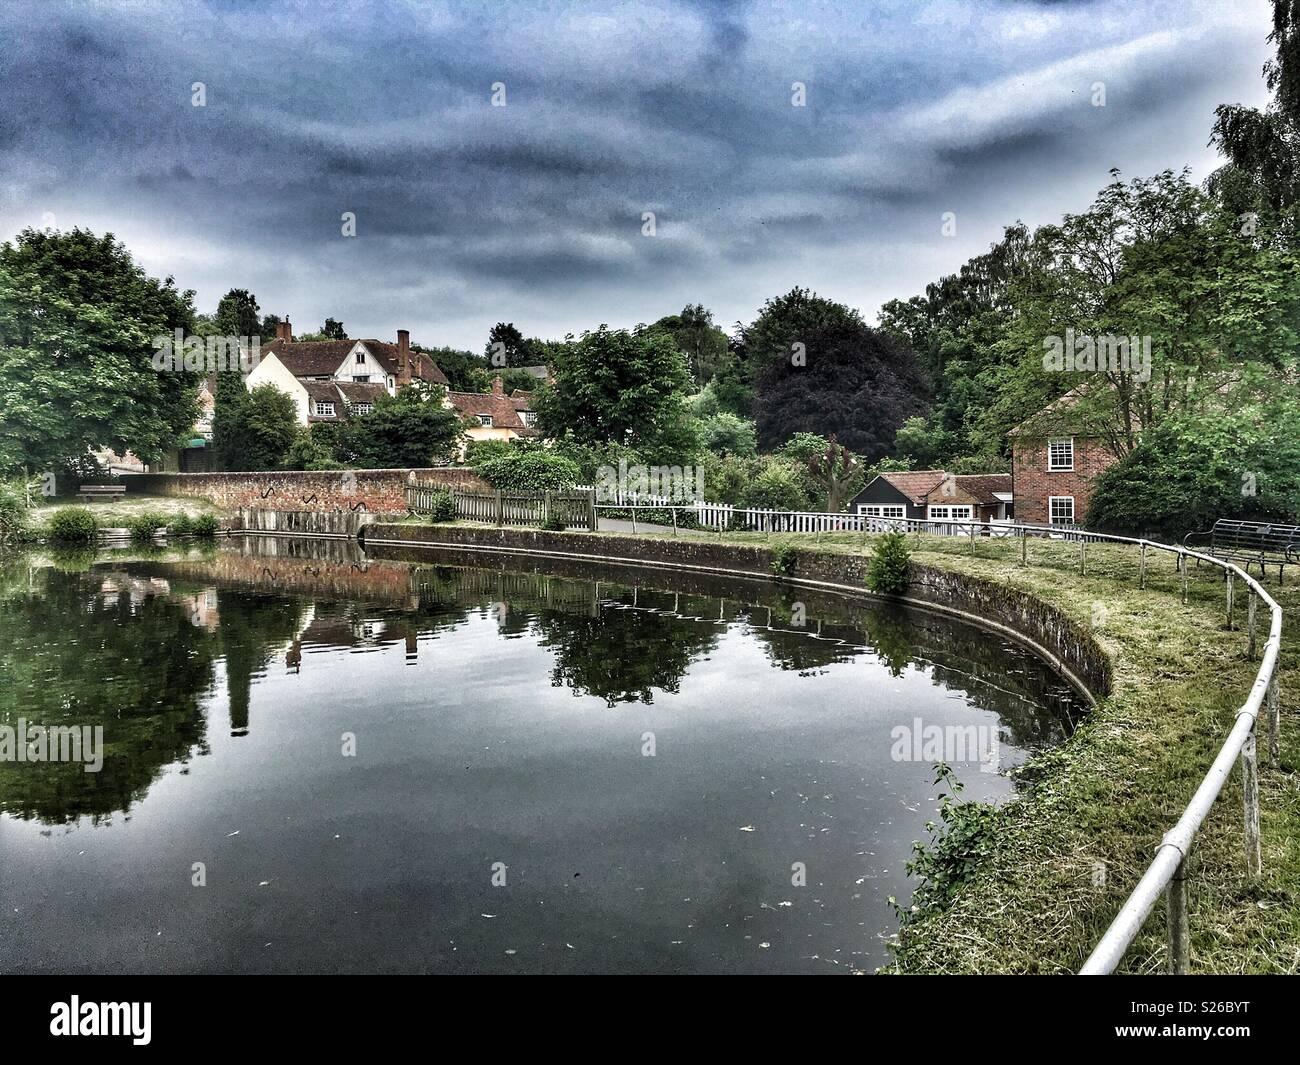 Polstead Suffolk England - Stock Image